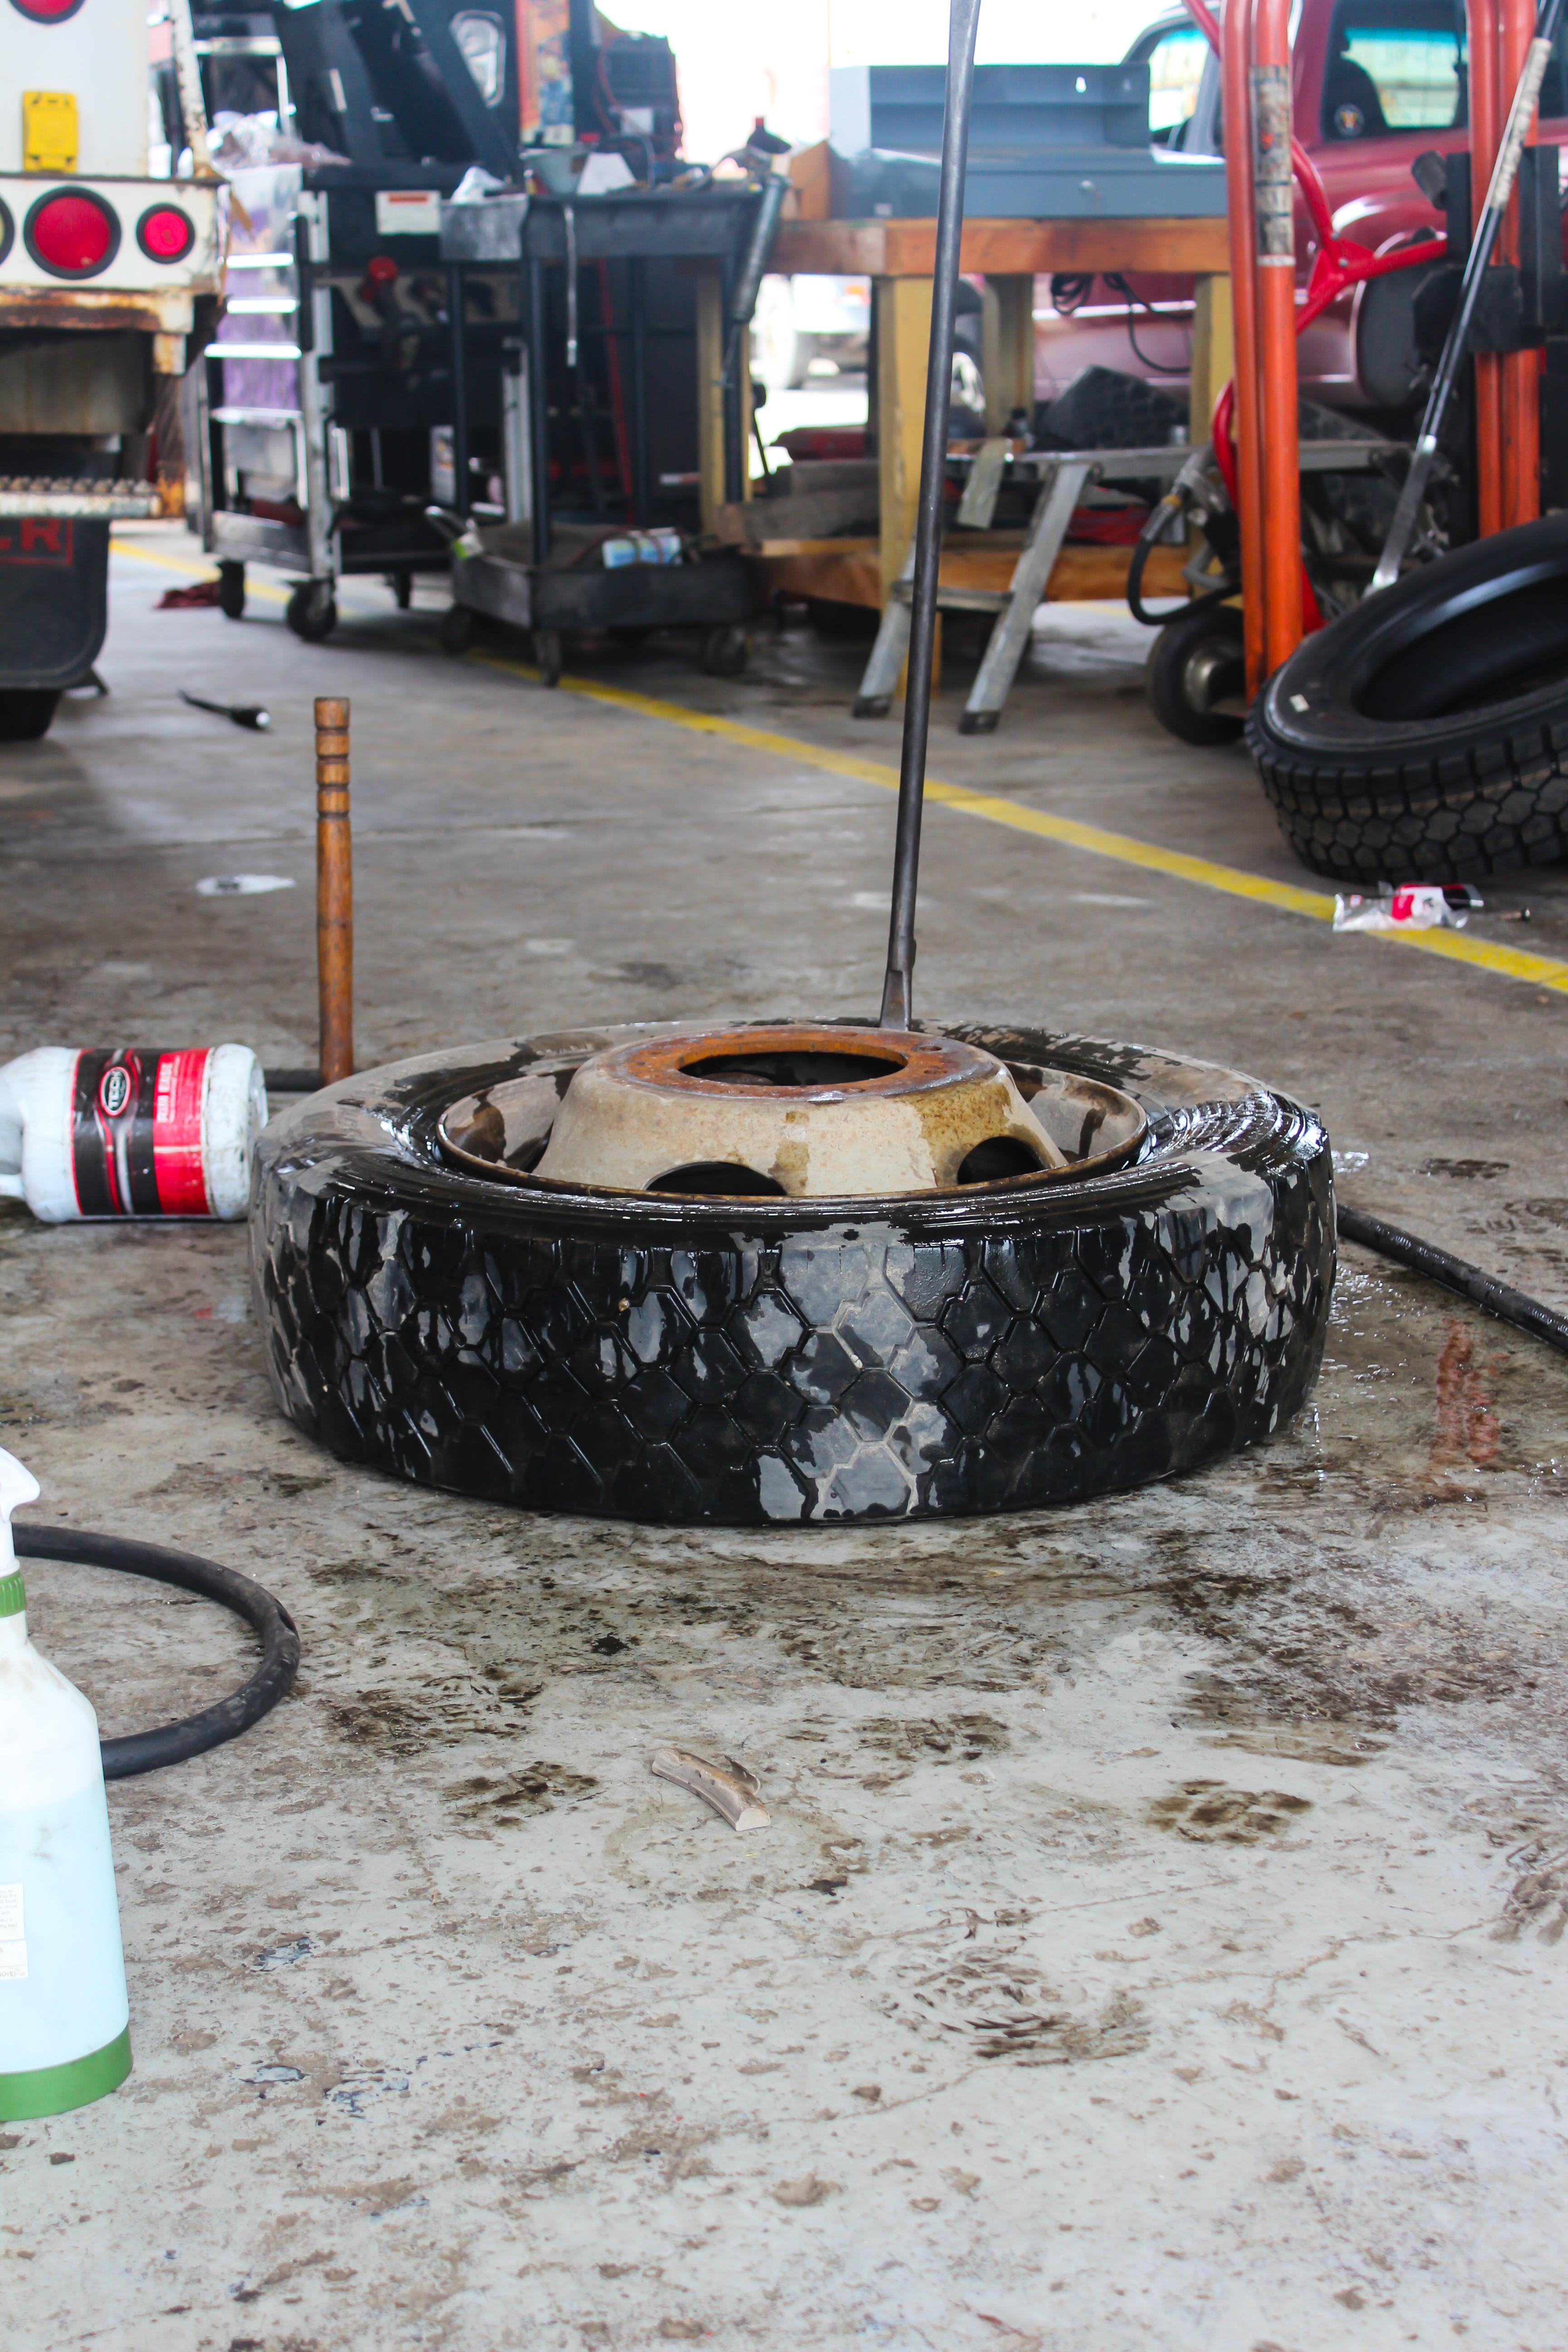 Service Description for Tire Change and Repair Image